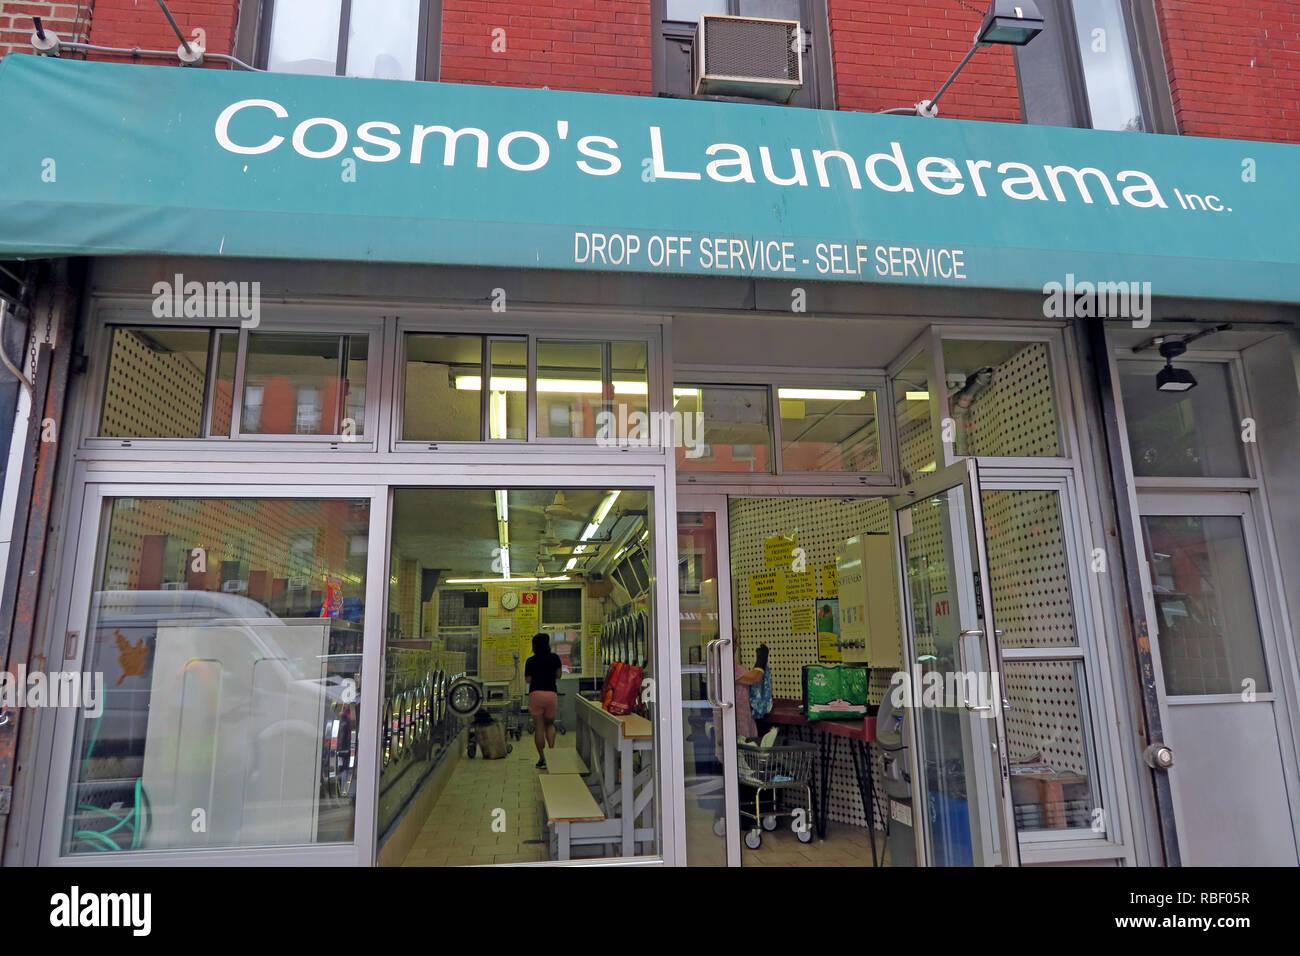 GoTonySmith,@HotpixUK,HotpixUK,NOHO NYC,NYC,New York City,street,New York Street,USA,America,City Centre,city,centre,center,city center,Eastvillage,New York Travel Tourism,store,stores,wash,washing,Cosmo,Cosmos,Launderama,clothes,Dolly Tub